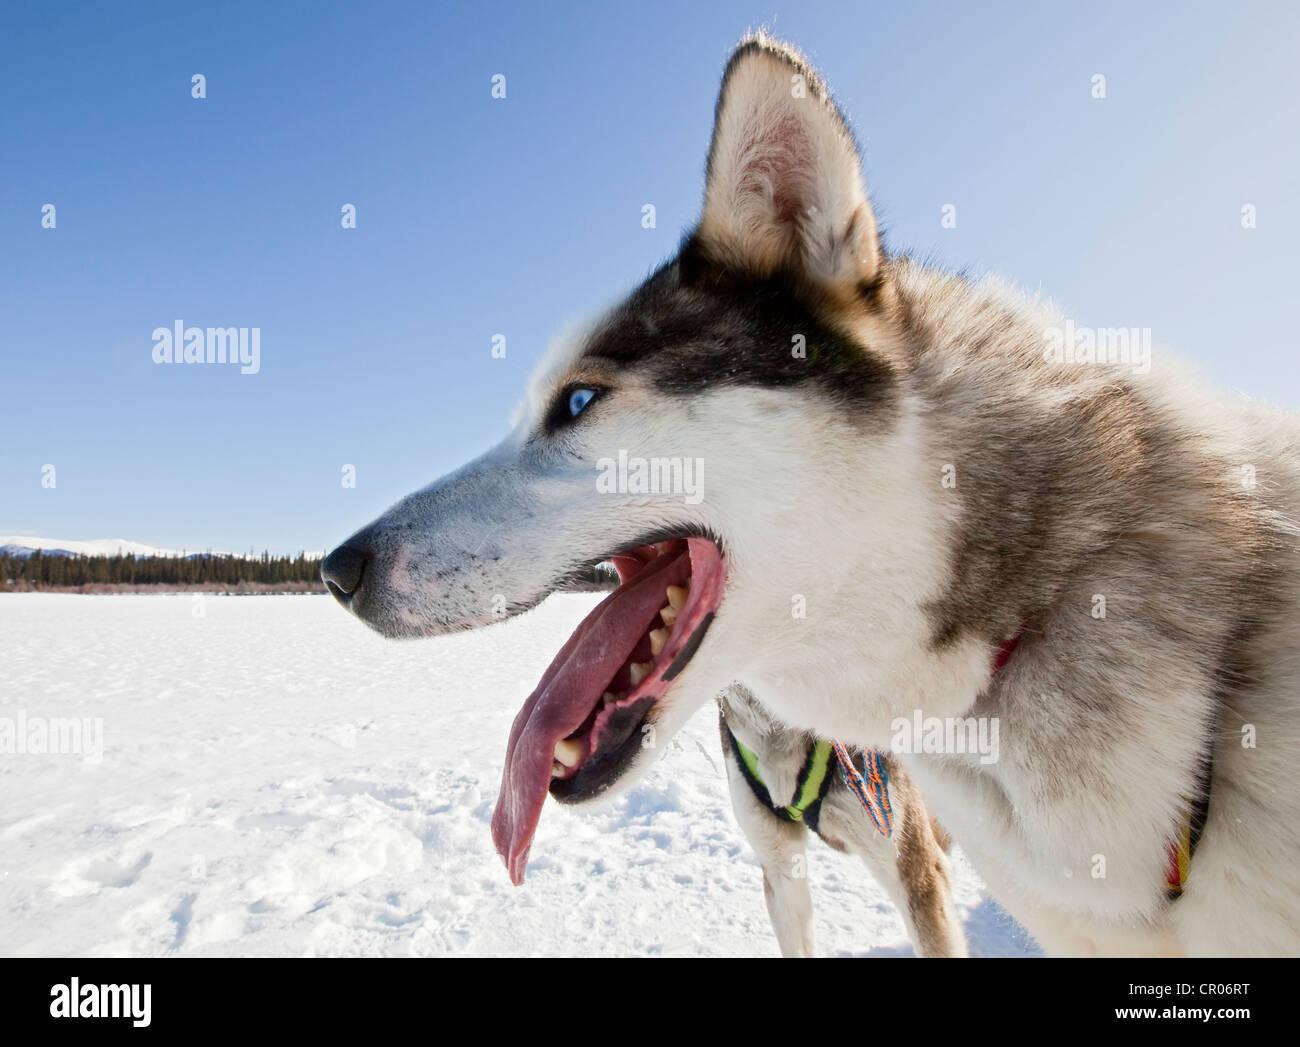 Portrait of panting sled dog, lead dog, Alaskan Husky, frozen Yukon River, Yukon Territory, Canada - Stock Image